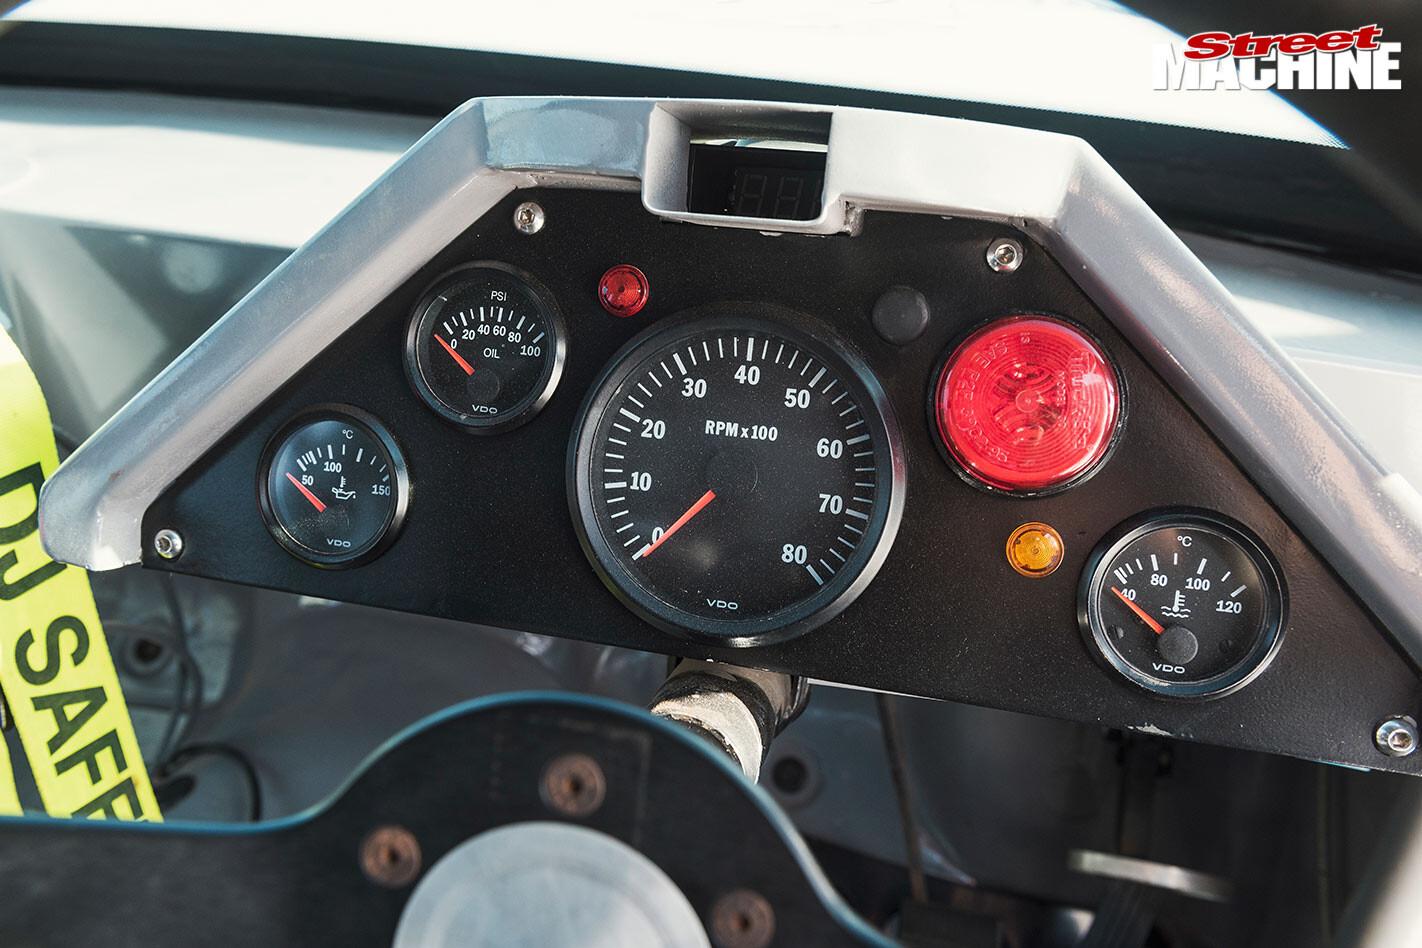 Holden VN Commodore dash